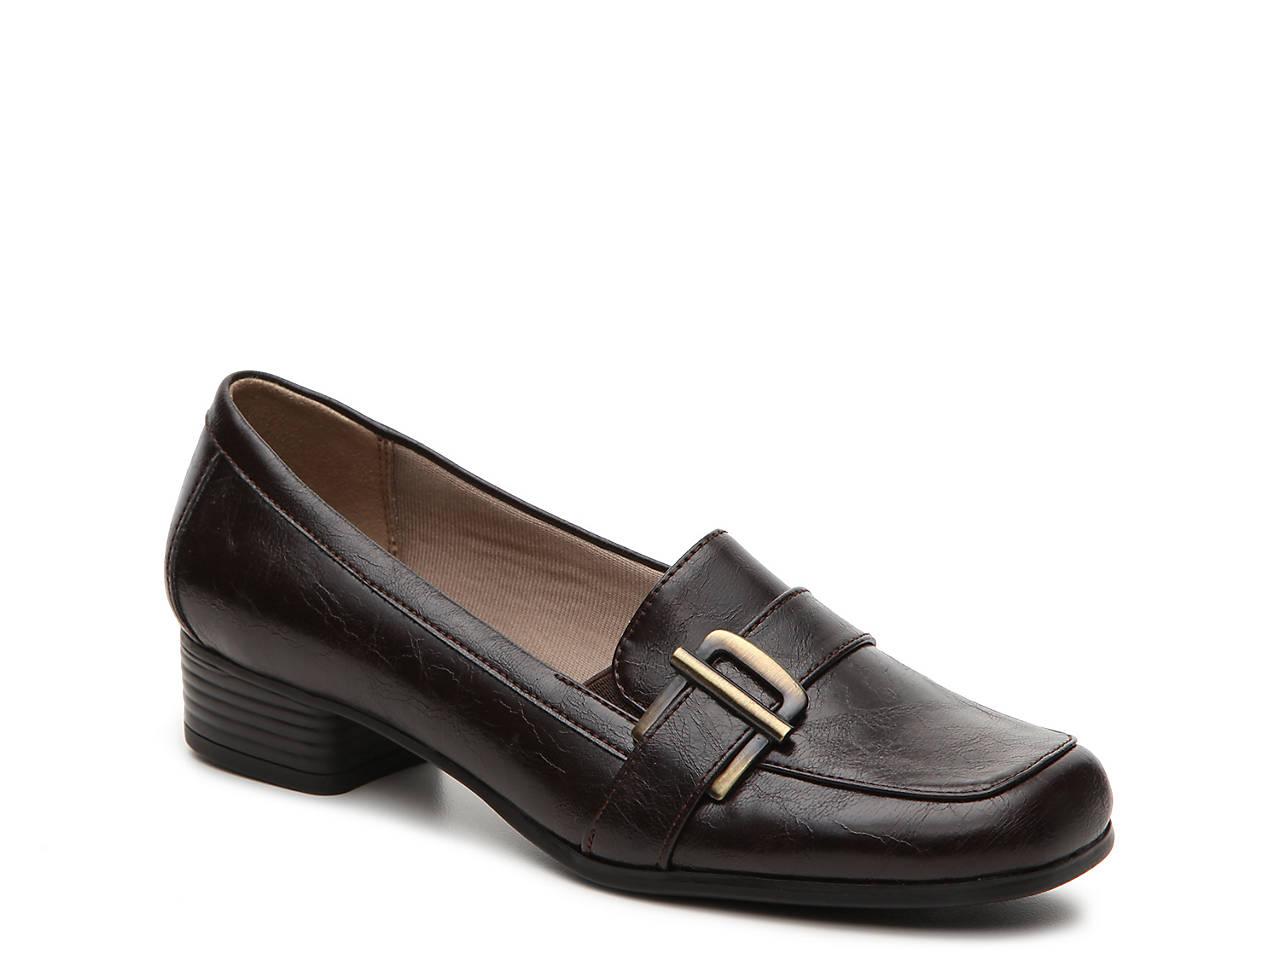 573dac8b9da LifeStride Bounty Loafer Women s Shoes